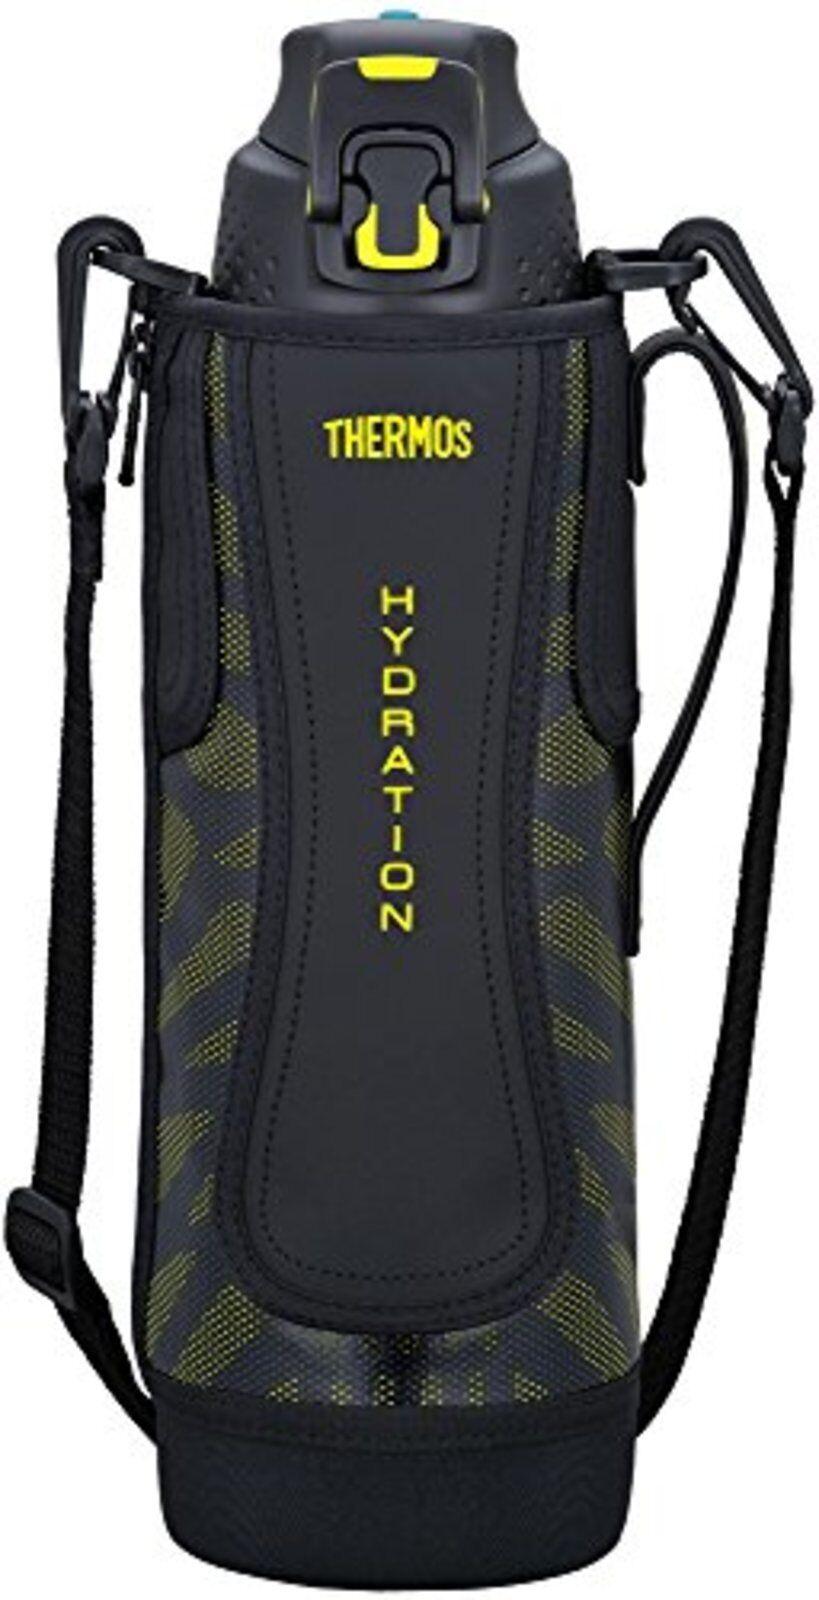 Thermos Aspirateur Isolation Bouteille Sports 1,5 L Noir Jaune Ffz-1501f Bky F